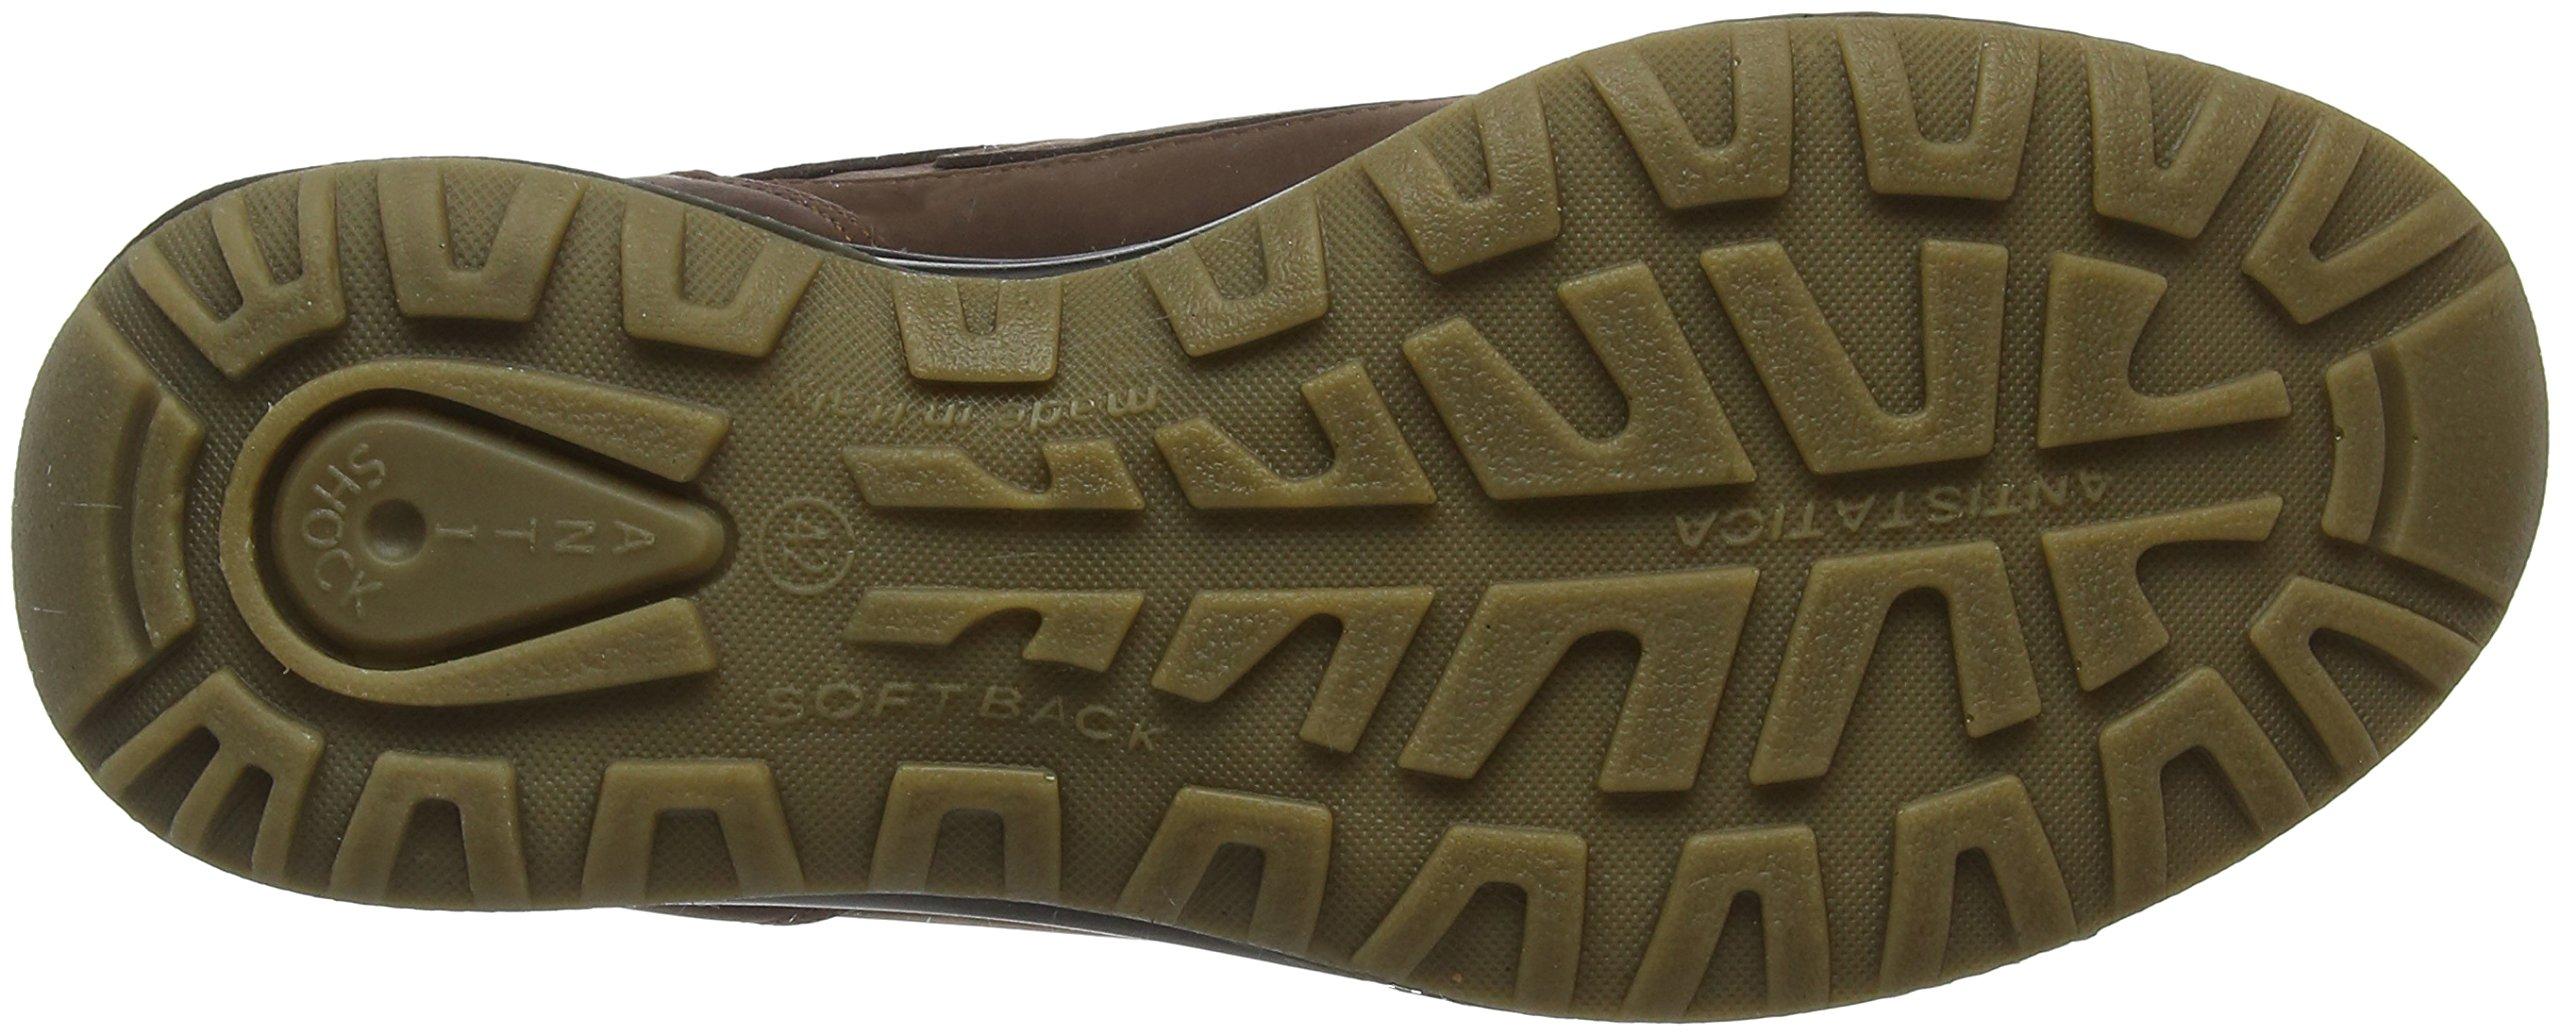 Grisport Men's Airwalker Walking Shoes 3